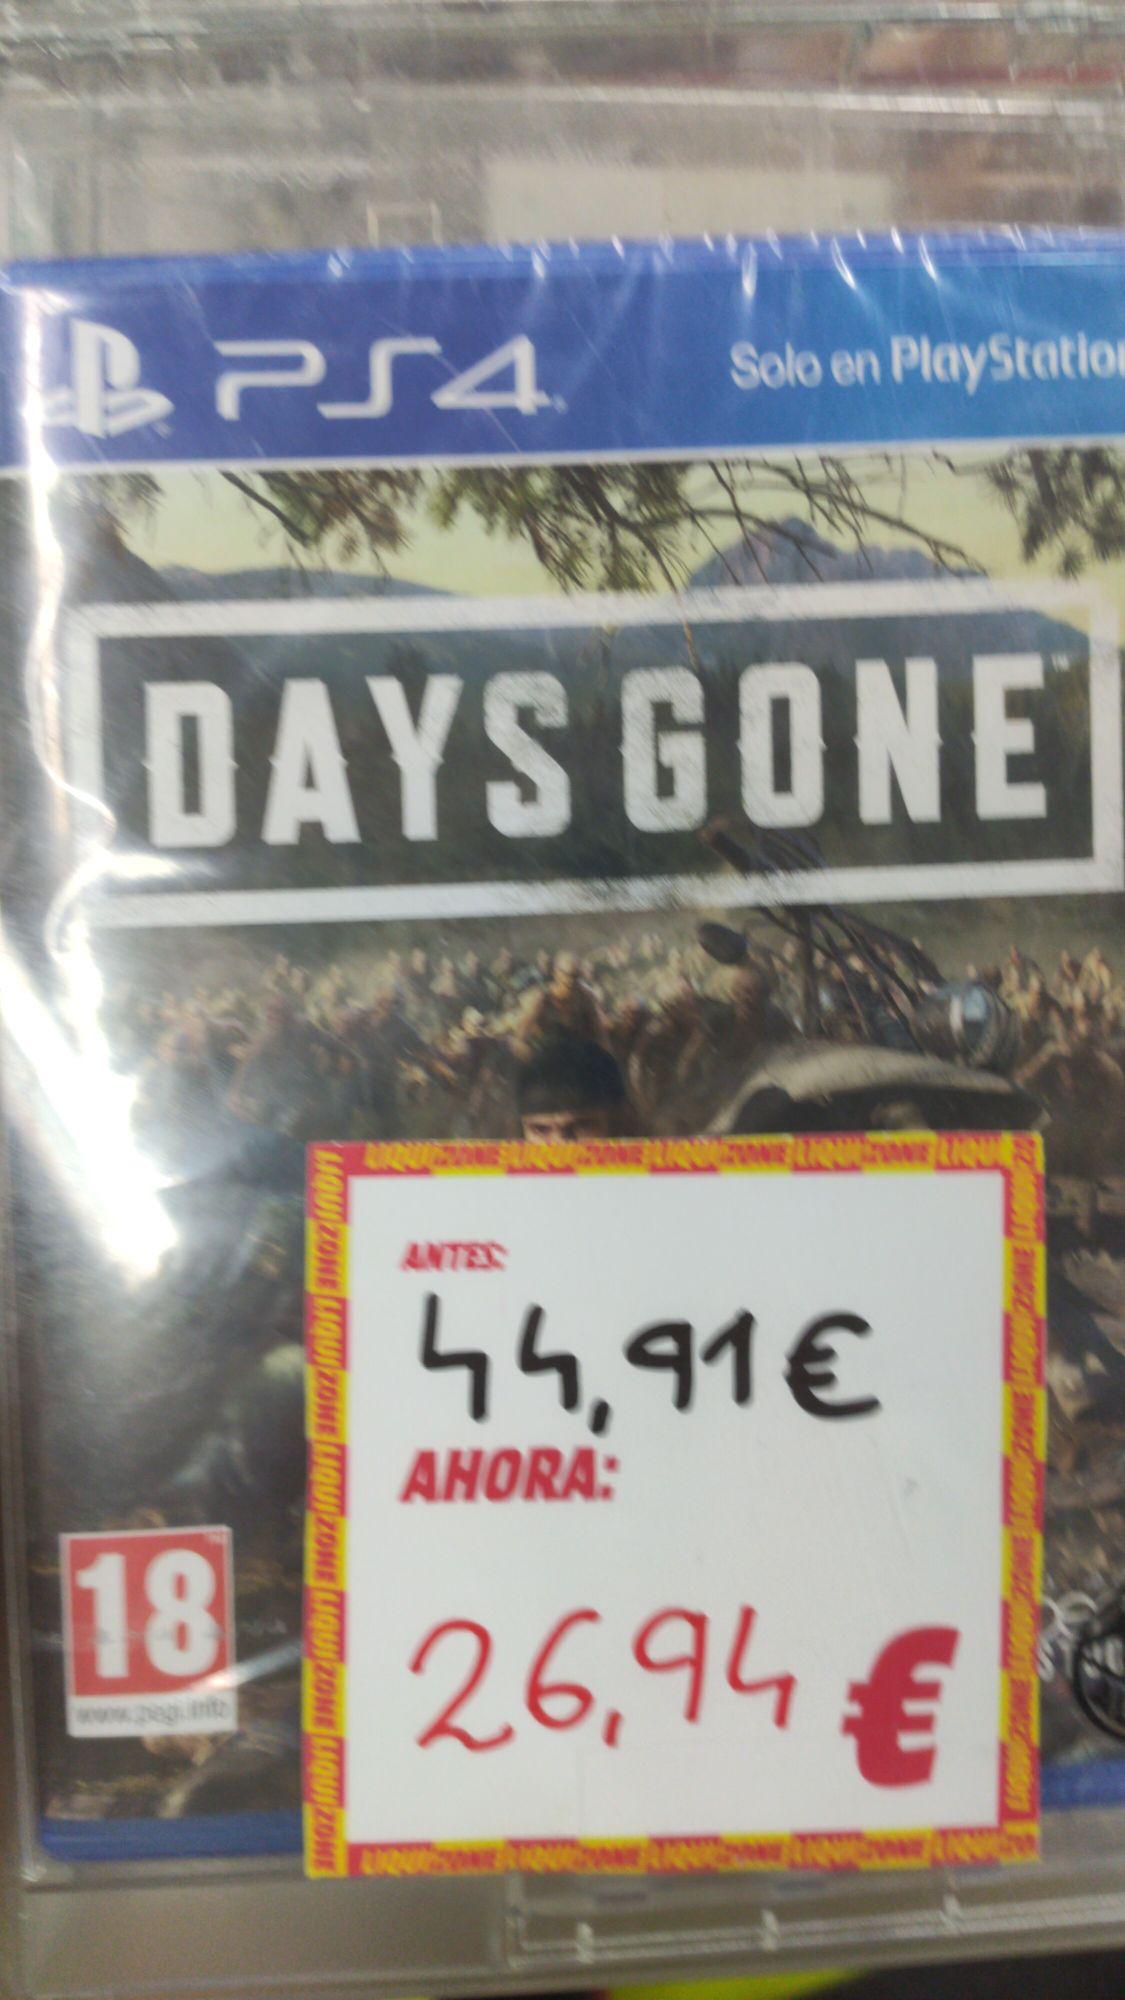 Days gone PS4 en mediamarkt Gandia